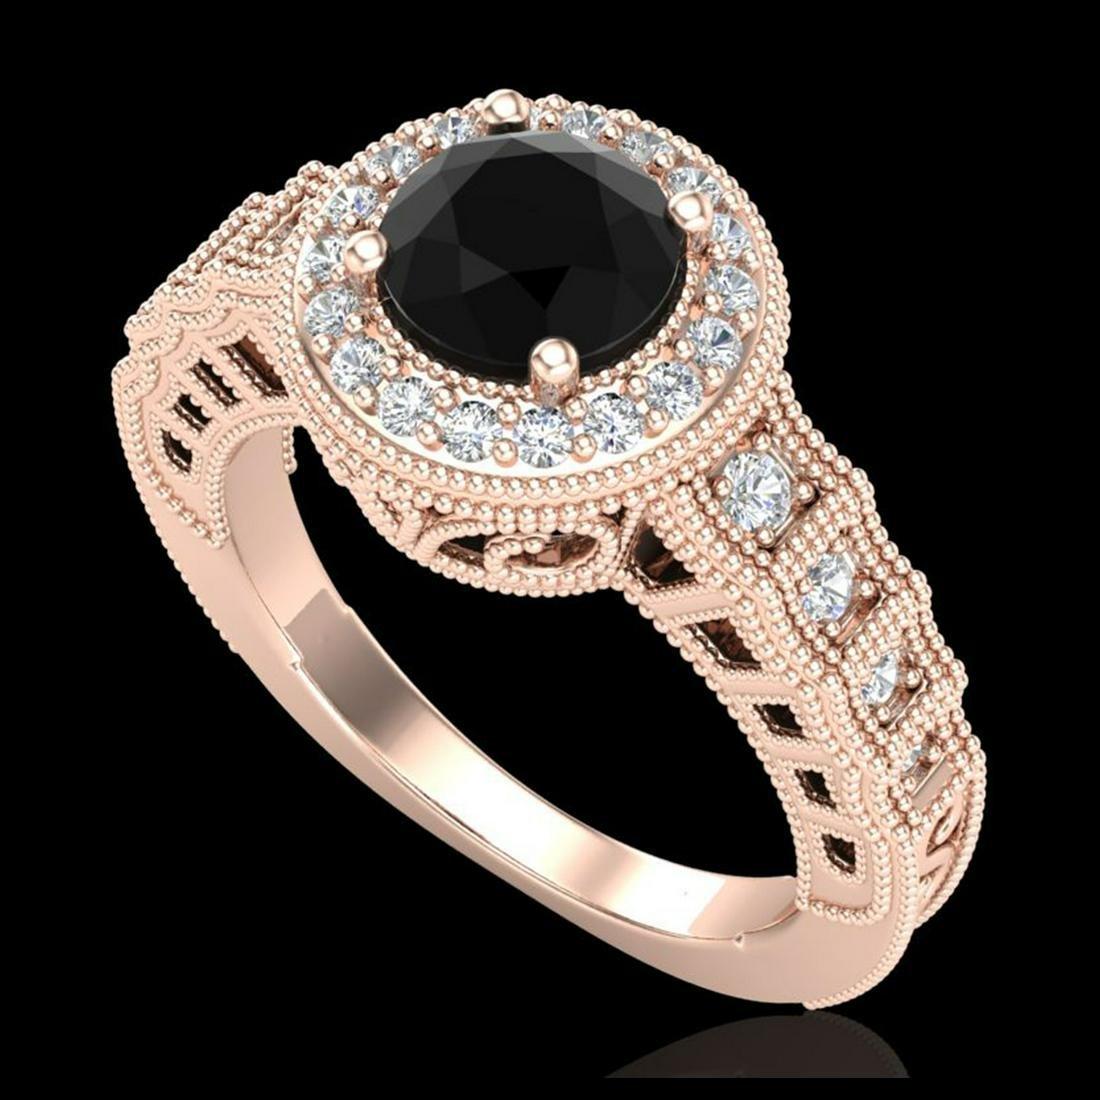 1.53 ctw Fancy Black Diamond Art Deco Ring 18K Rose